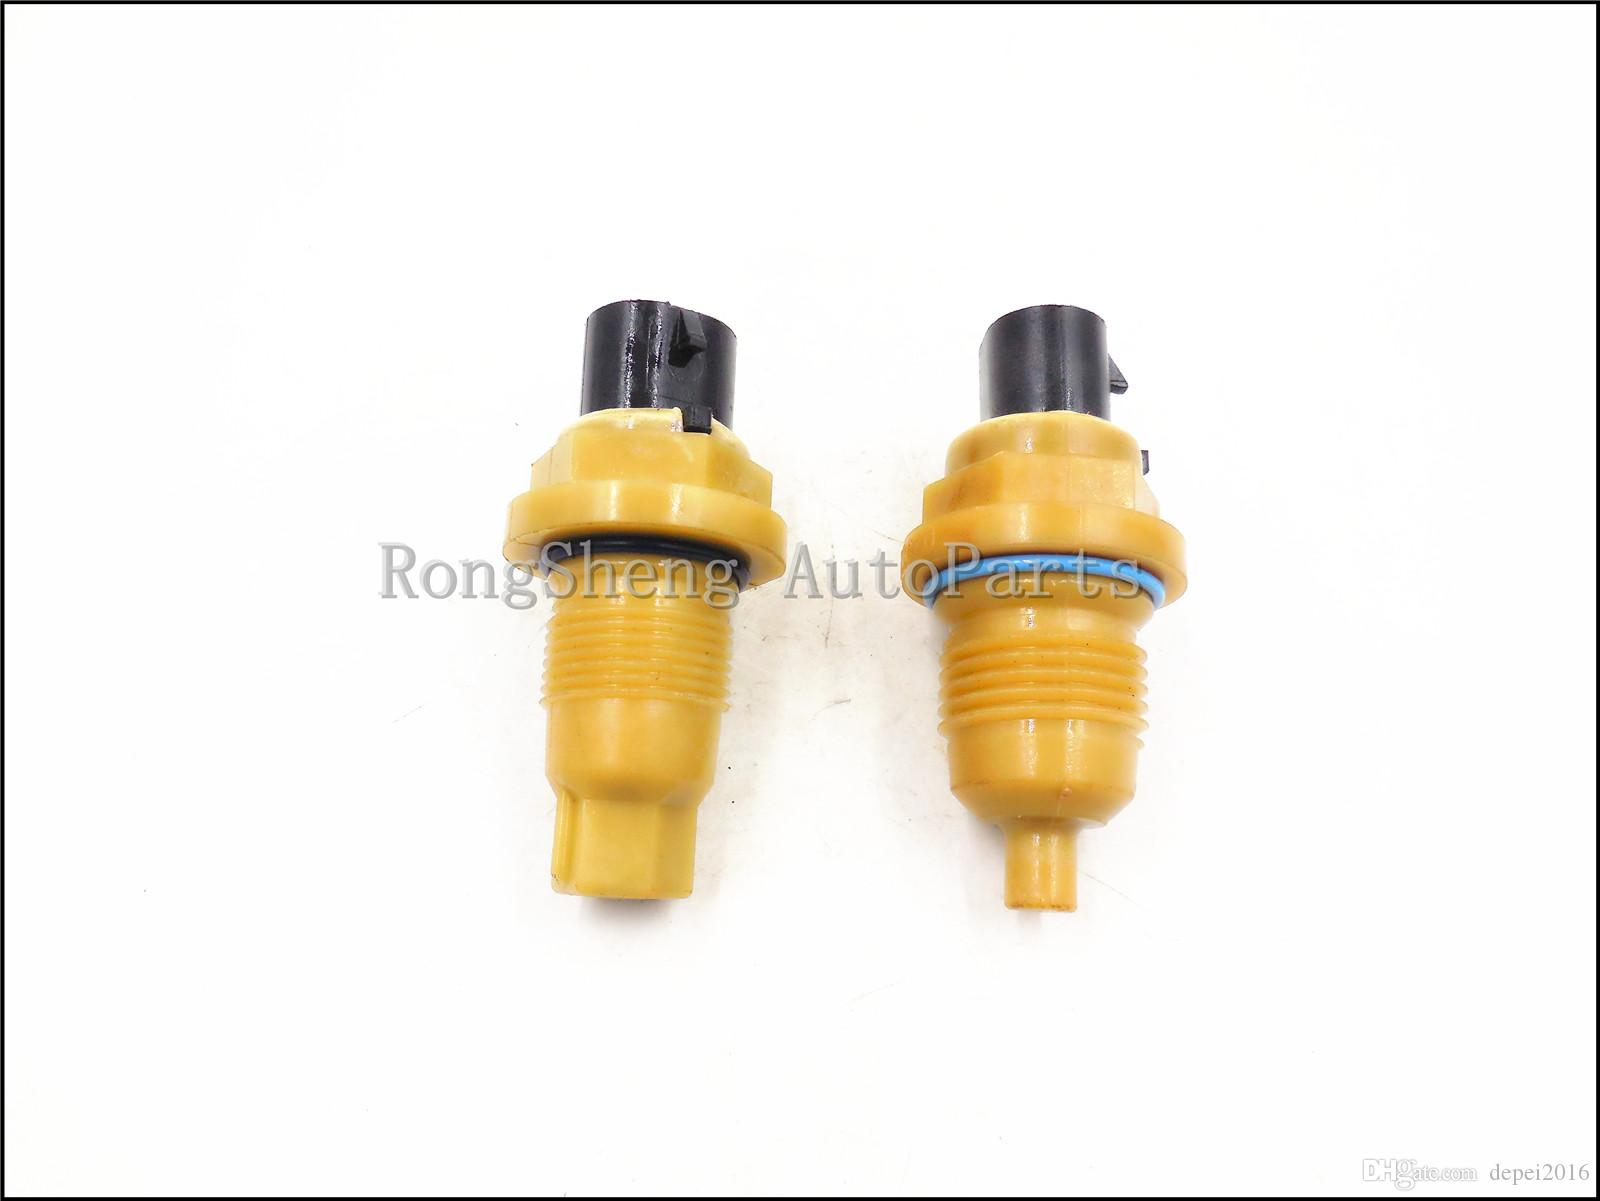 For A604 40TE 41TE 41TES Transmission MOPAR Input Output Speed Sensor Kit  SET 2 PCS 04800879 04800878